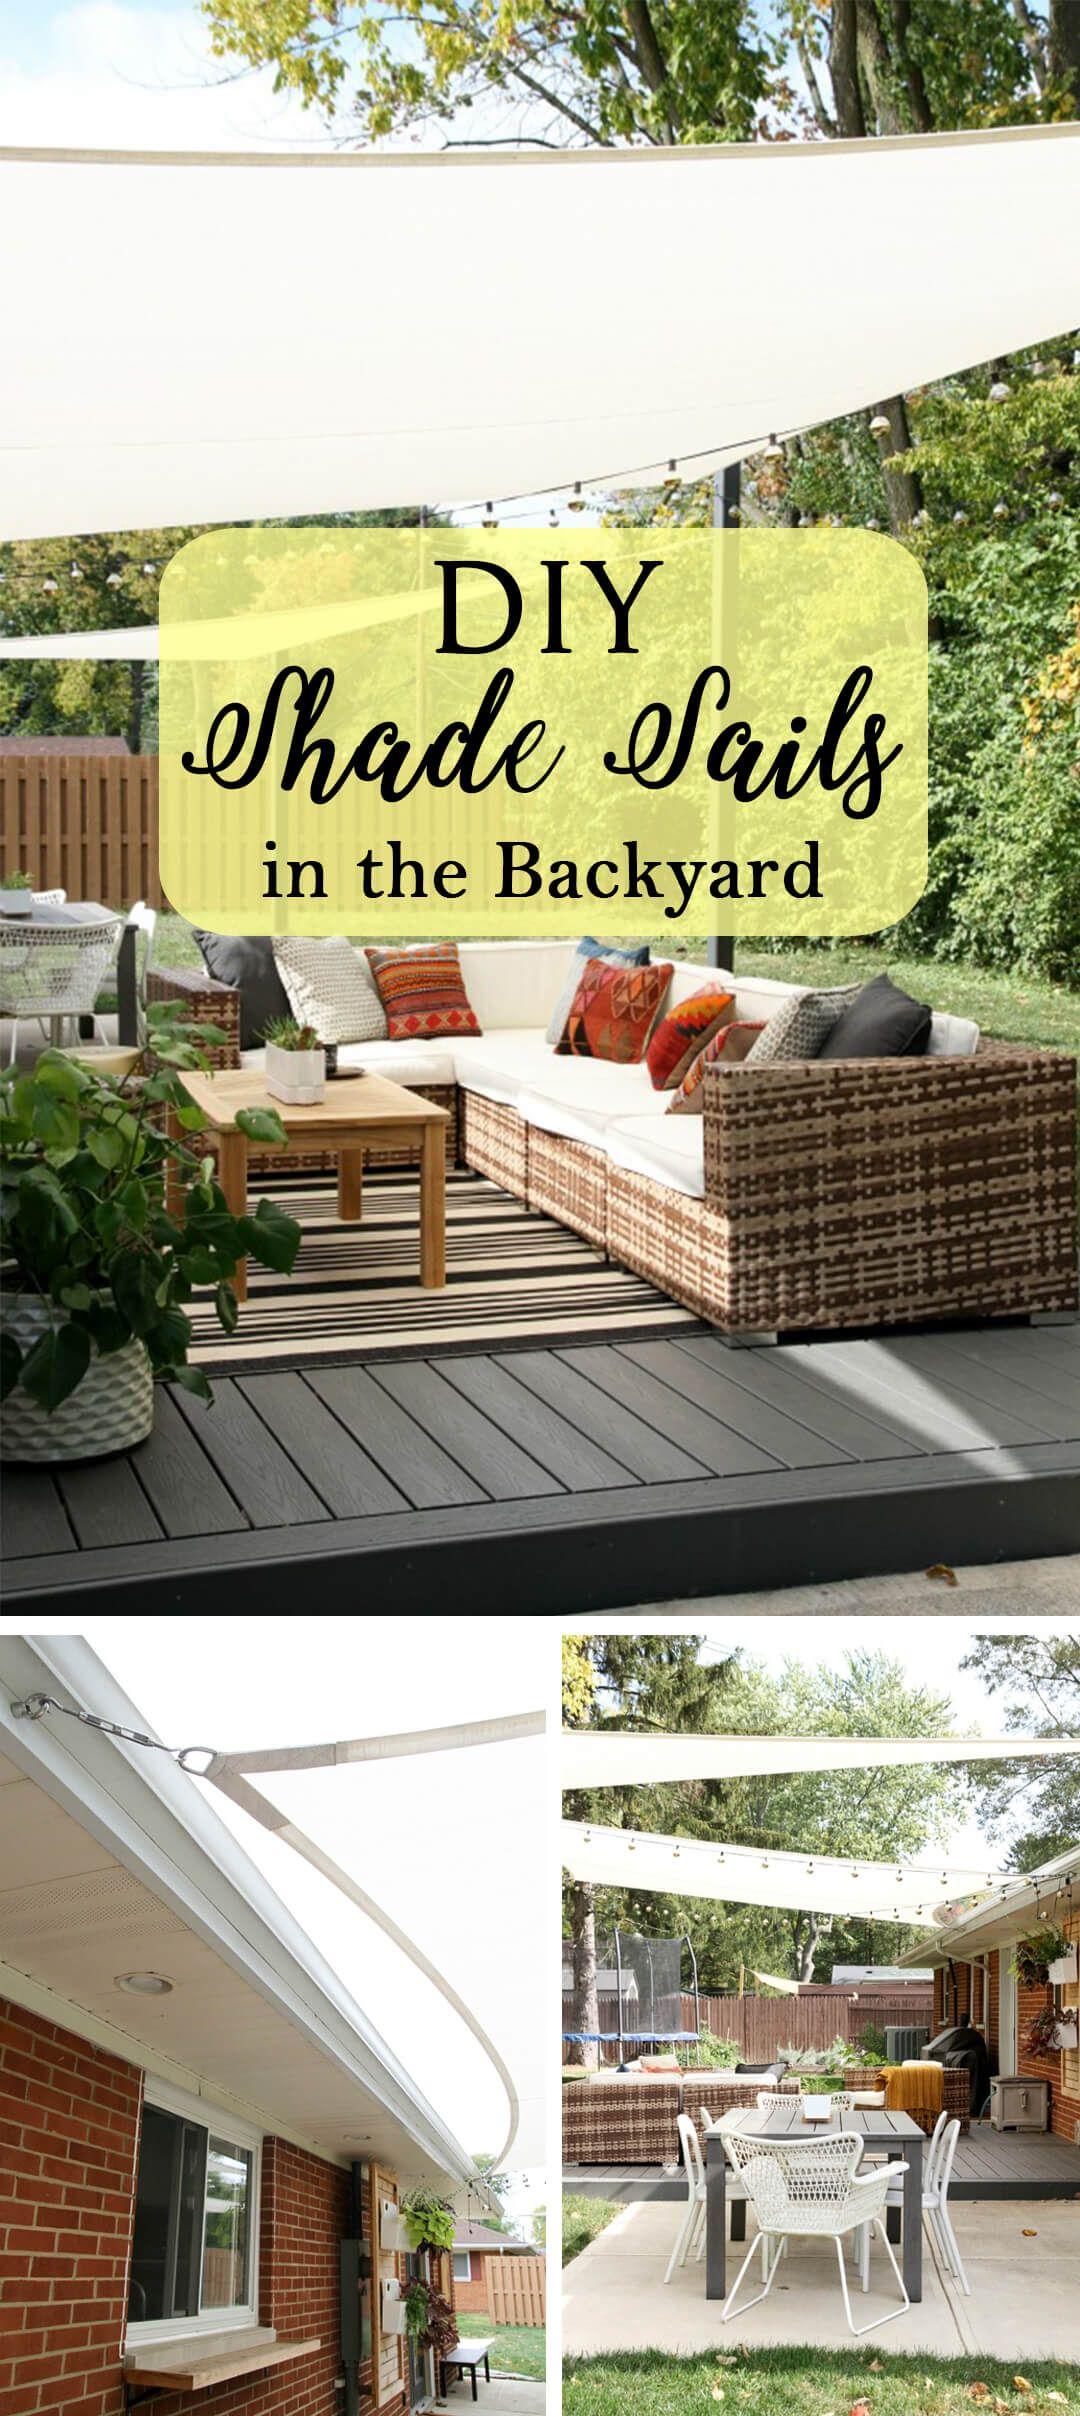 22 easy diy sun shade ideas for your backyard or patio